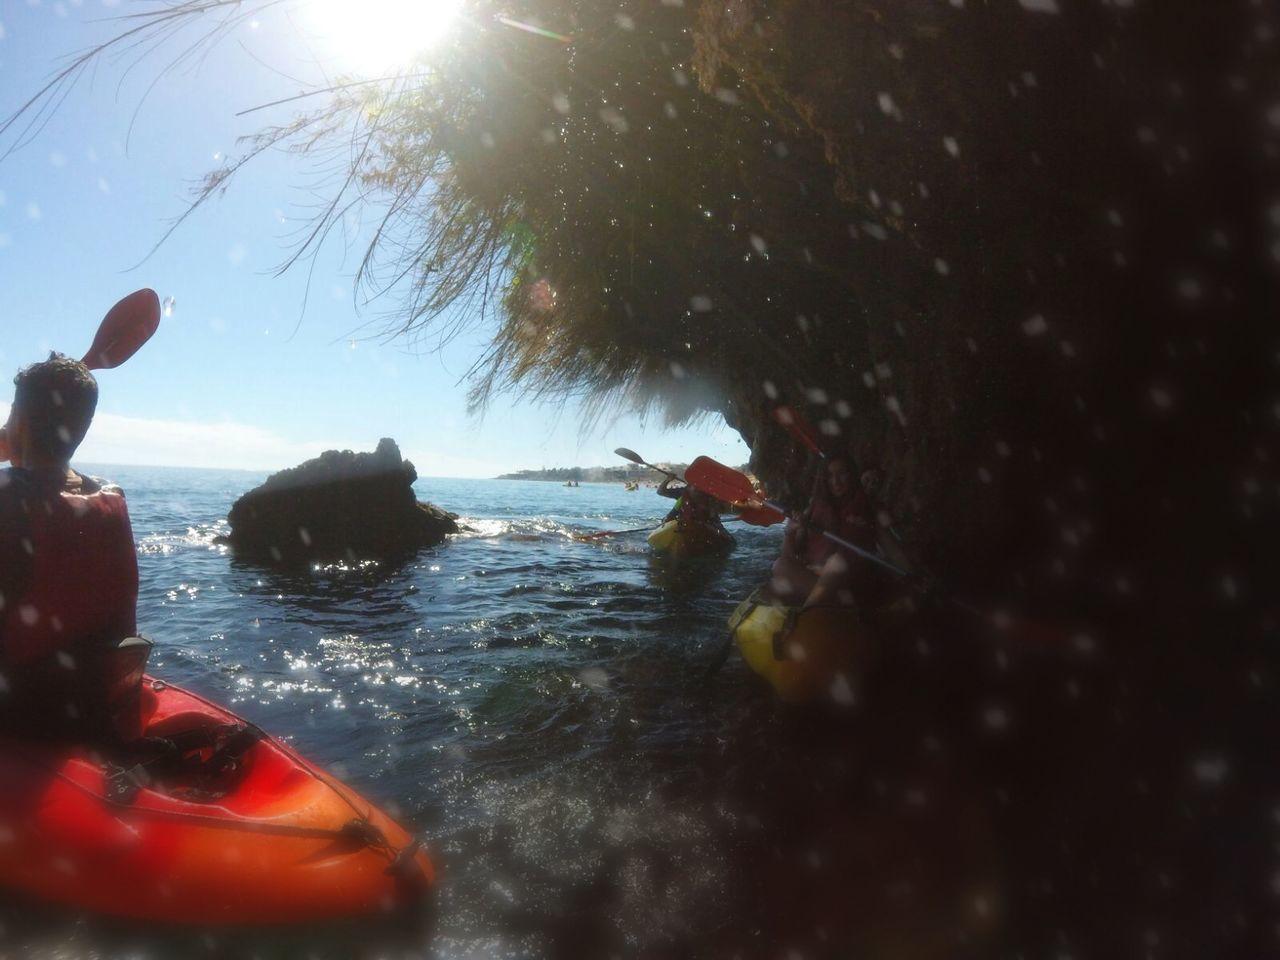 Close-up Day Kayaking Nature Nautical Vessel Nerja Coast Outdoors People Sea Sky SPAIN Sun Sunbeam Tree Water